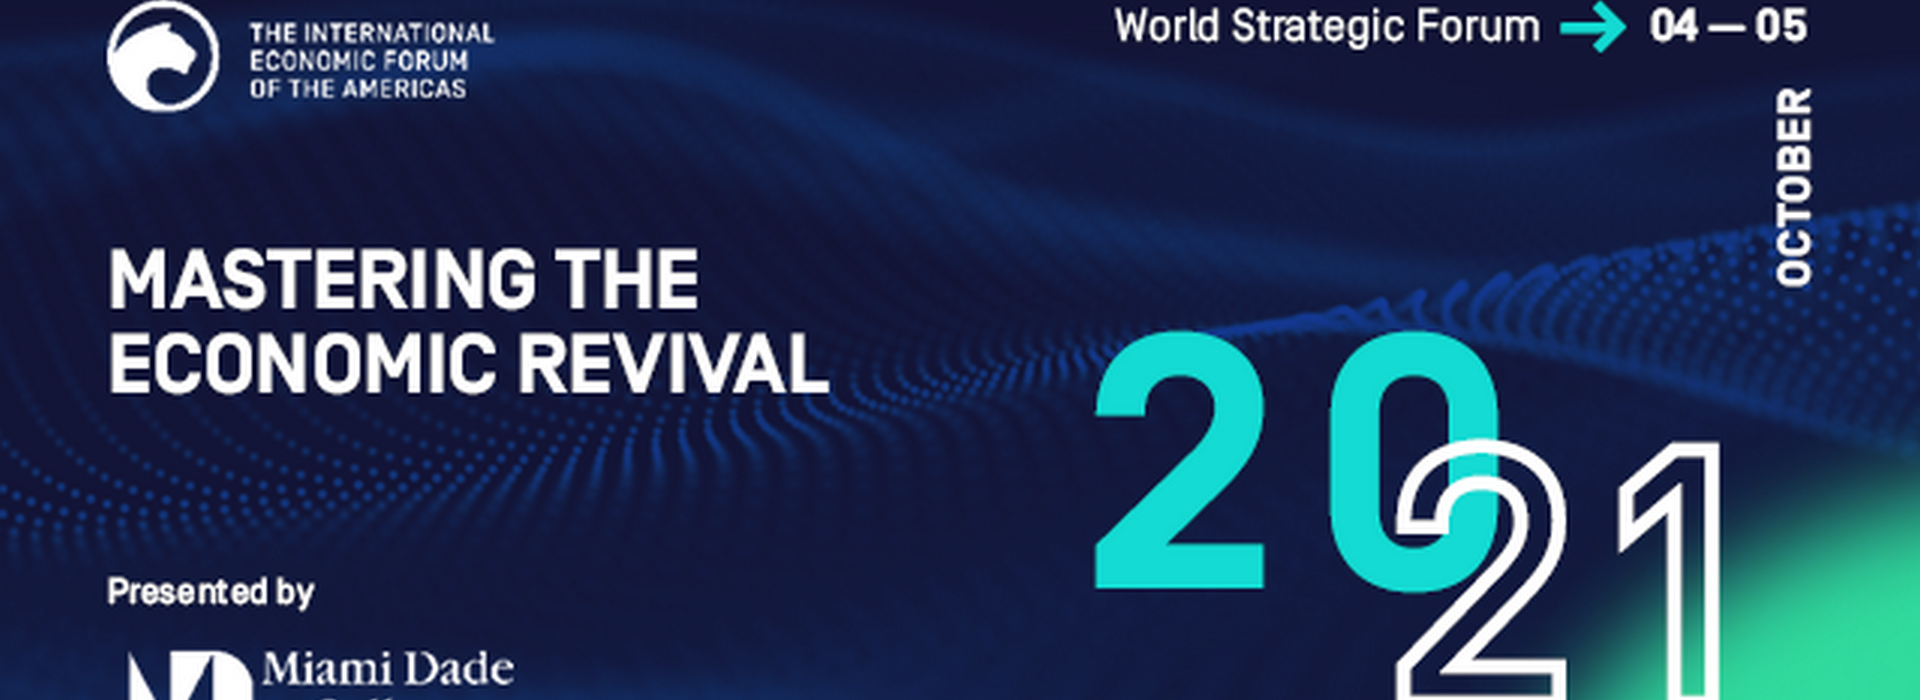 World Strategic Forum